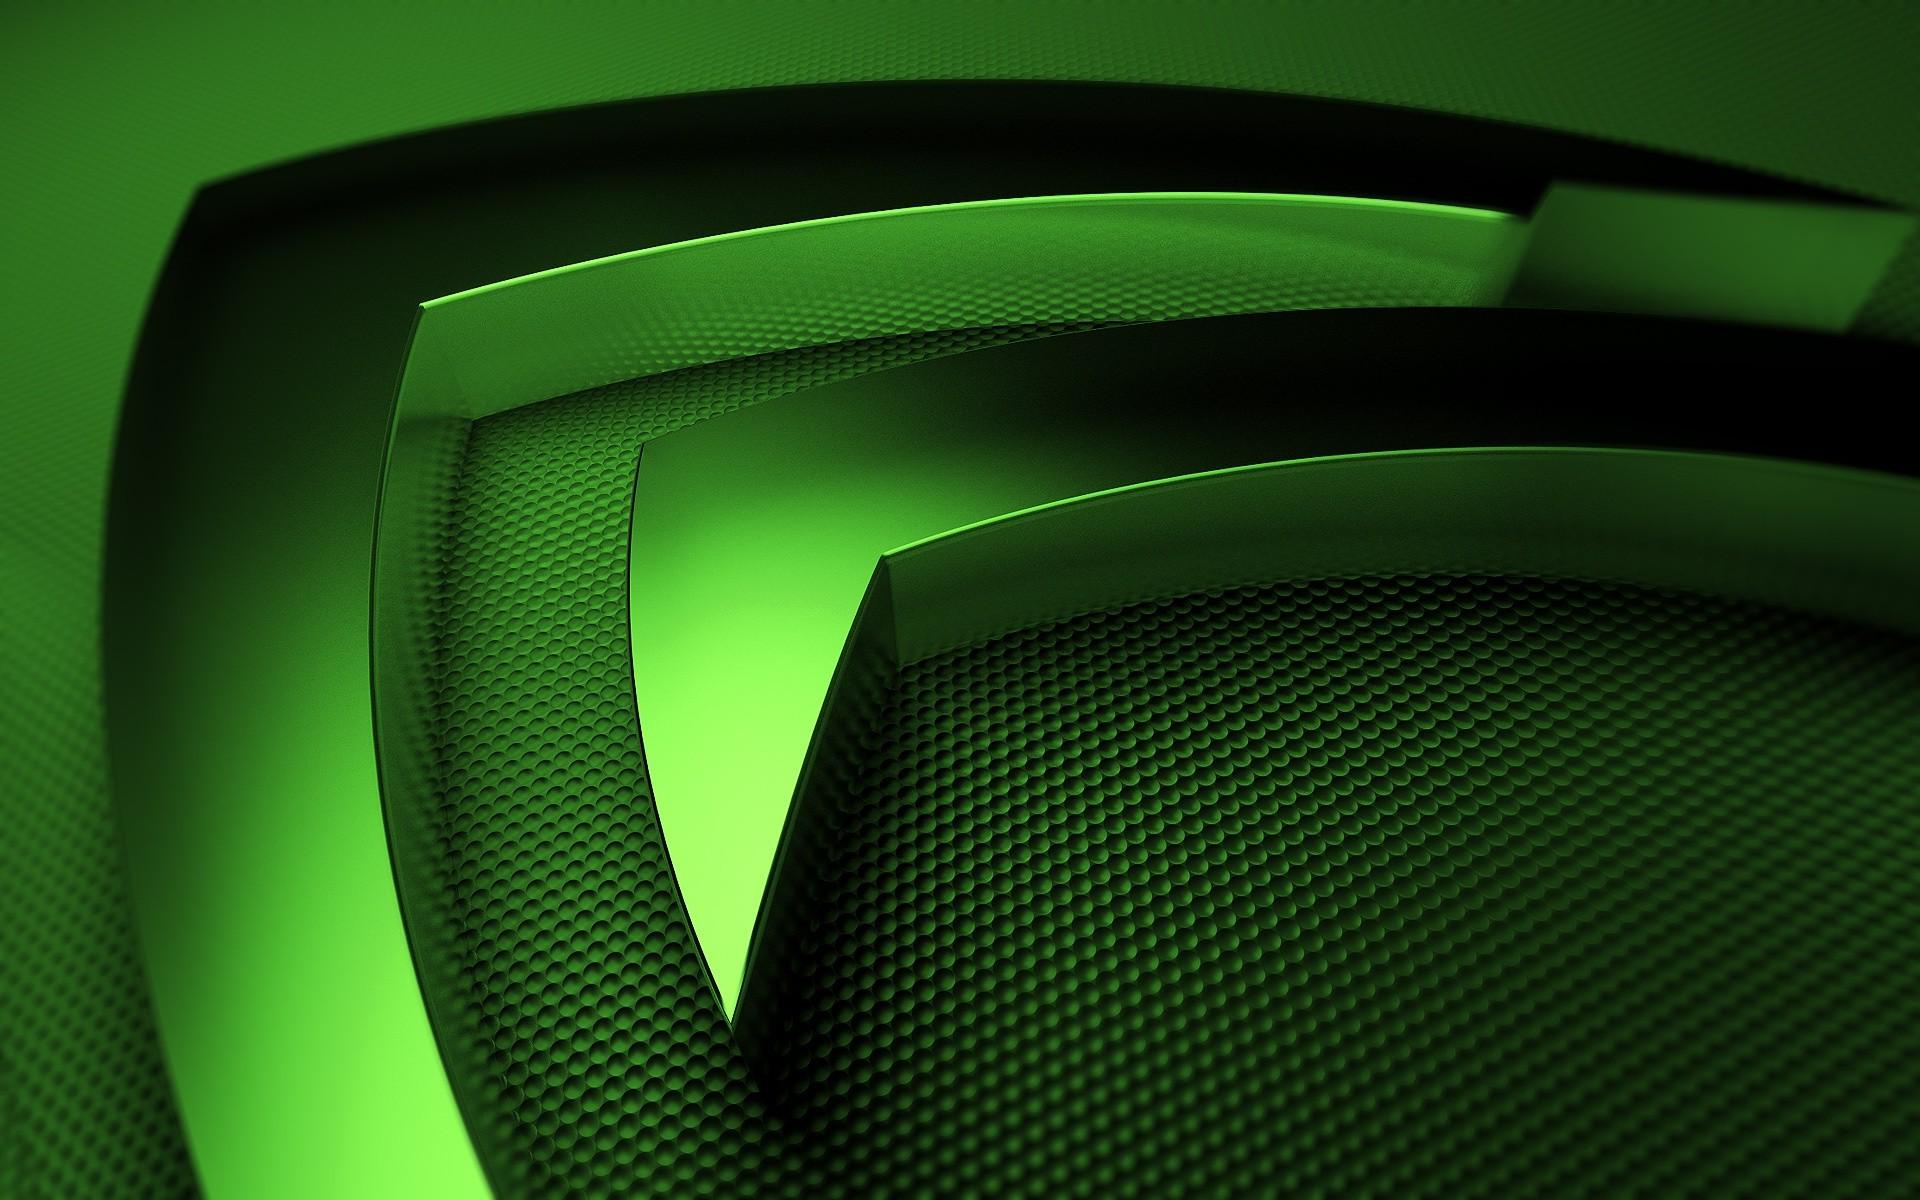 Fondos De Pantalla Videojuegos Logo Verde Circulo